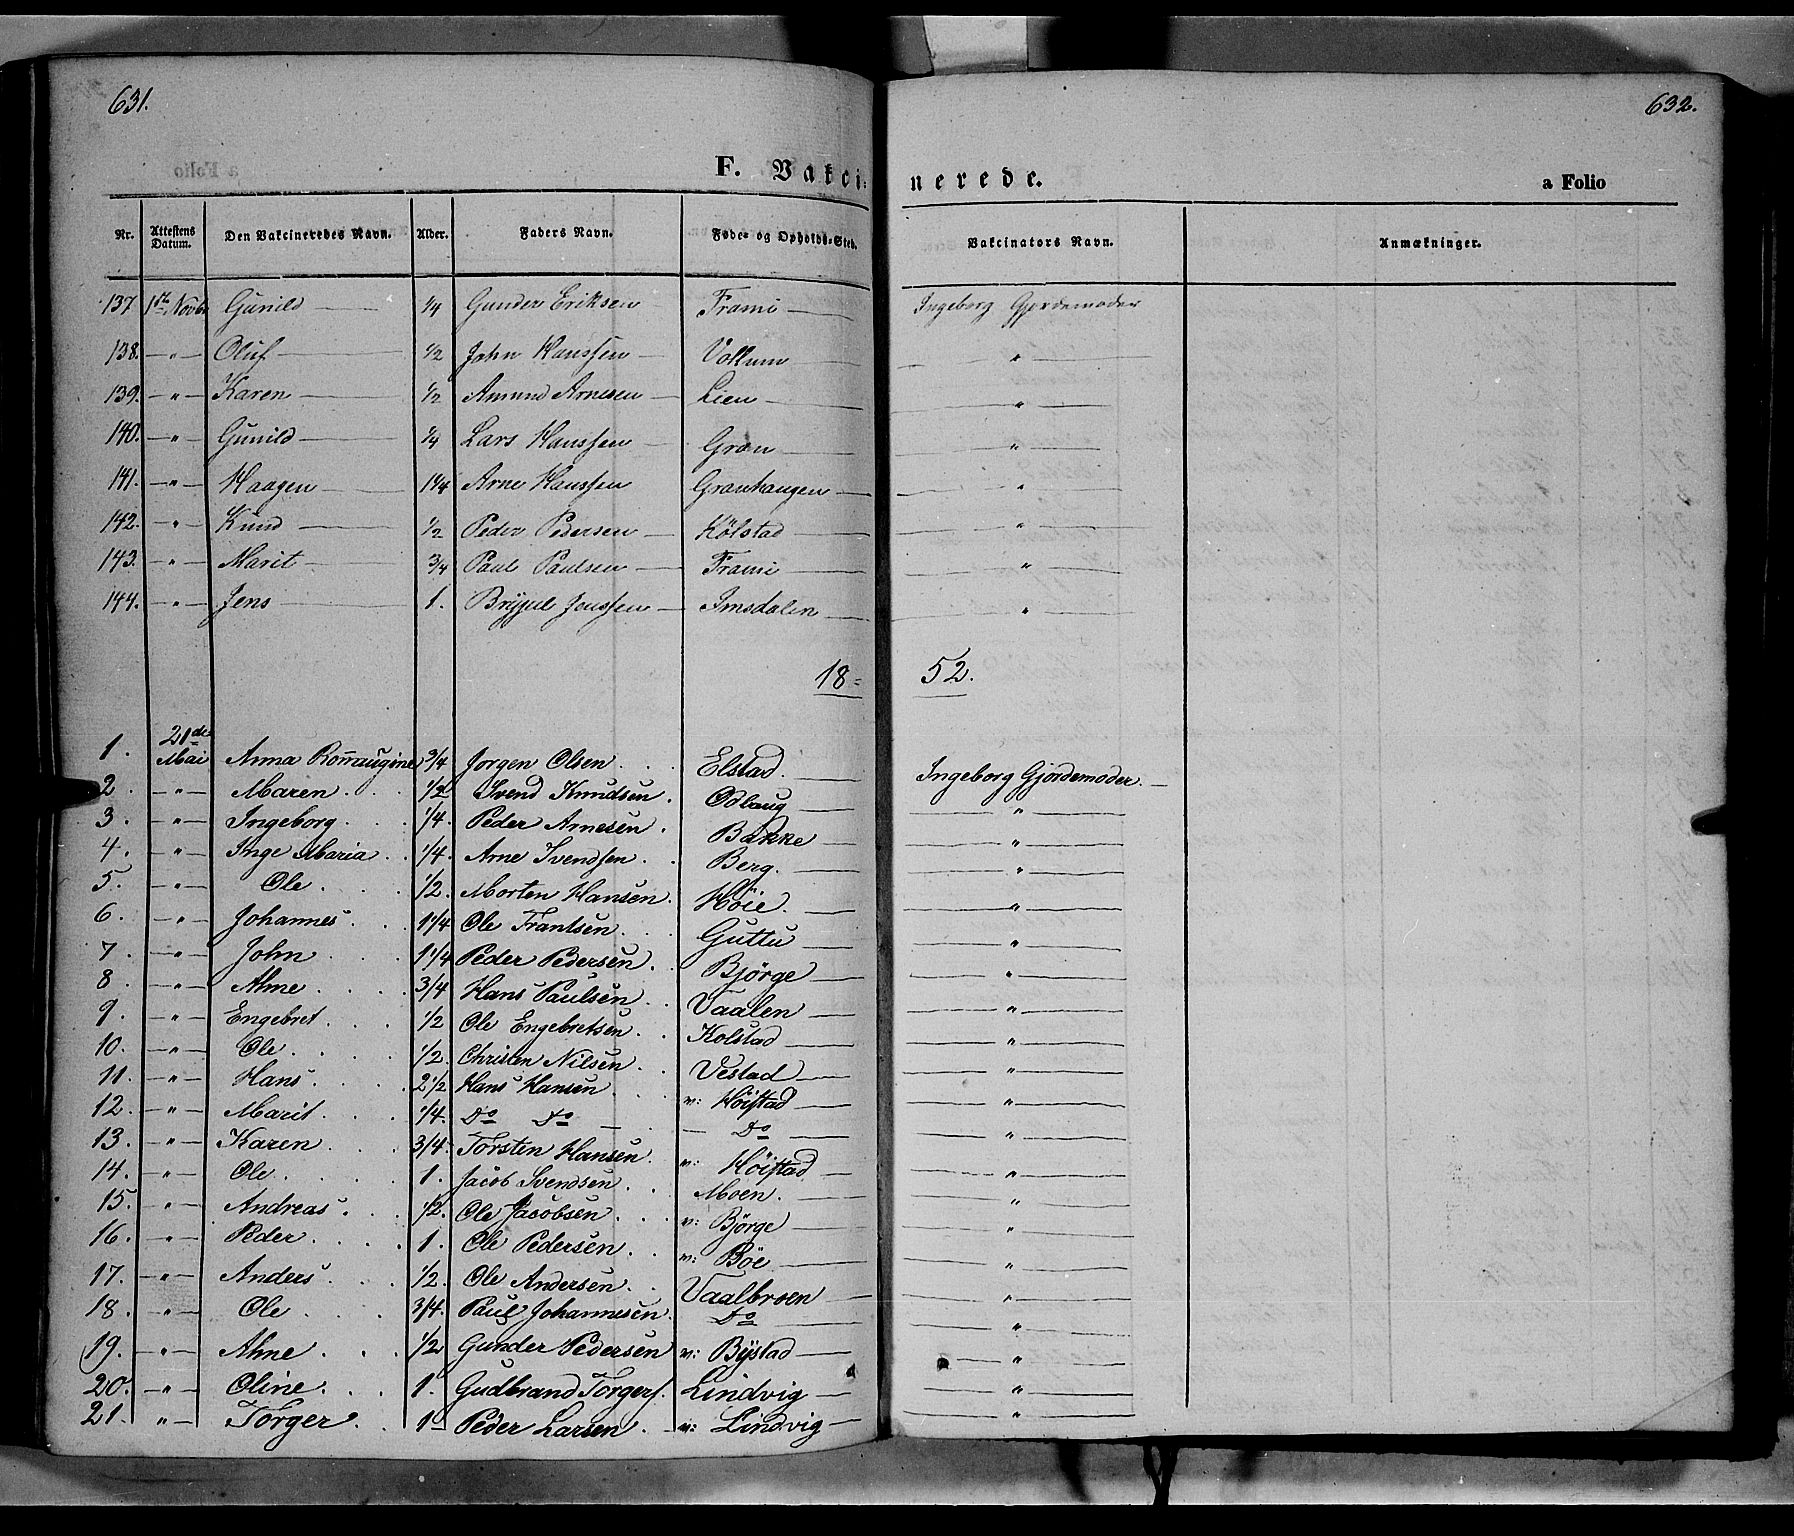 SAH, Ringebu prestekontor, Ministerialbok nr. 6, 1848-1859, s. 631-632